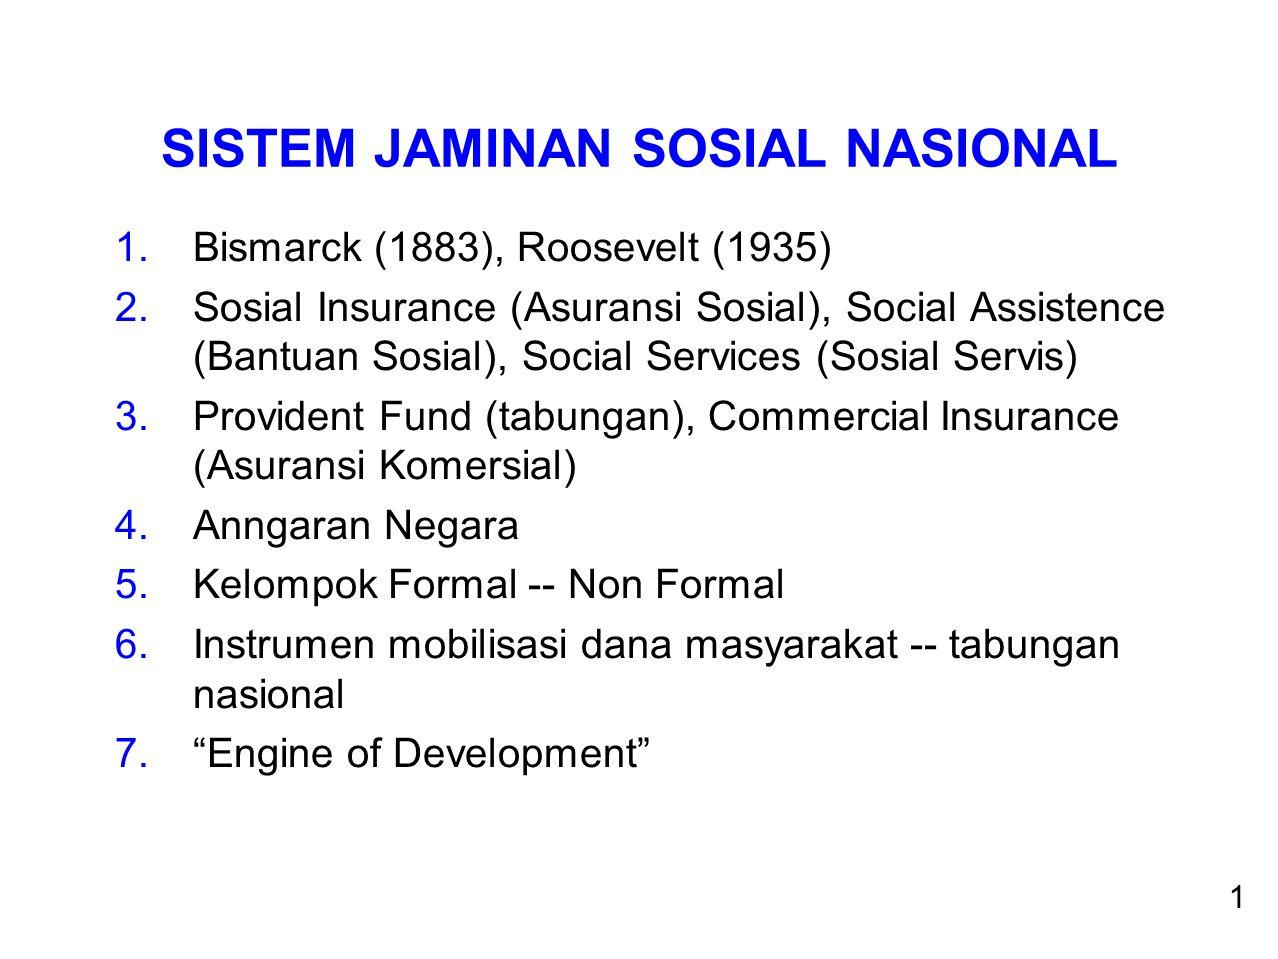 SISTEM JAMINAN SOSIAL NASIONAL 1.Bismarck (1883), Roosevelt (1935) 2.Sosial Insurance (Asuransi Sosial), Social Assistence (Bantuan Sosial), Social Se